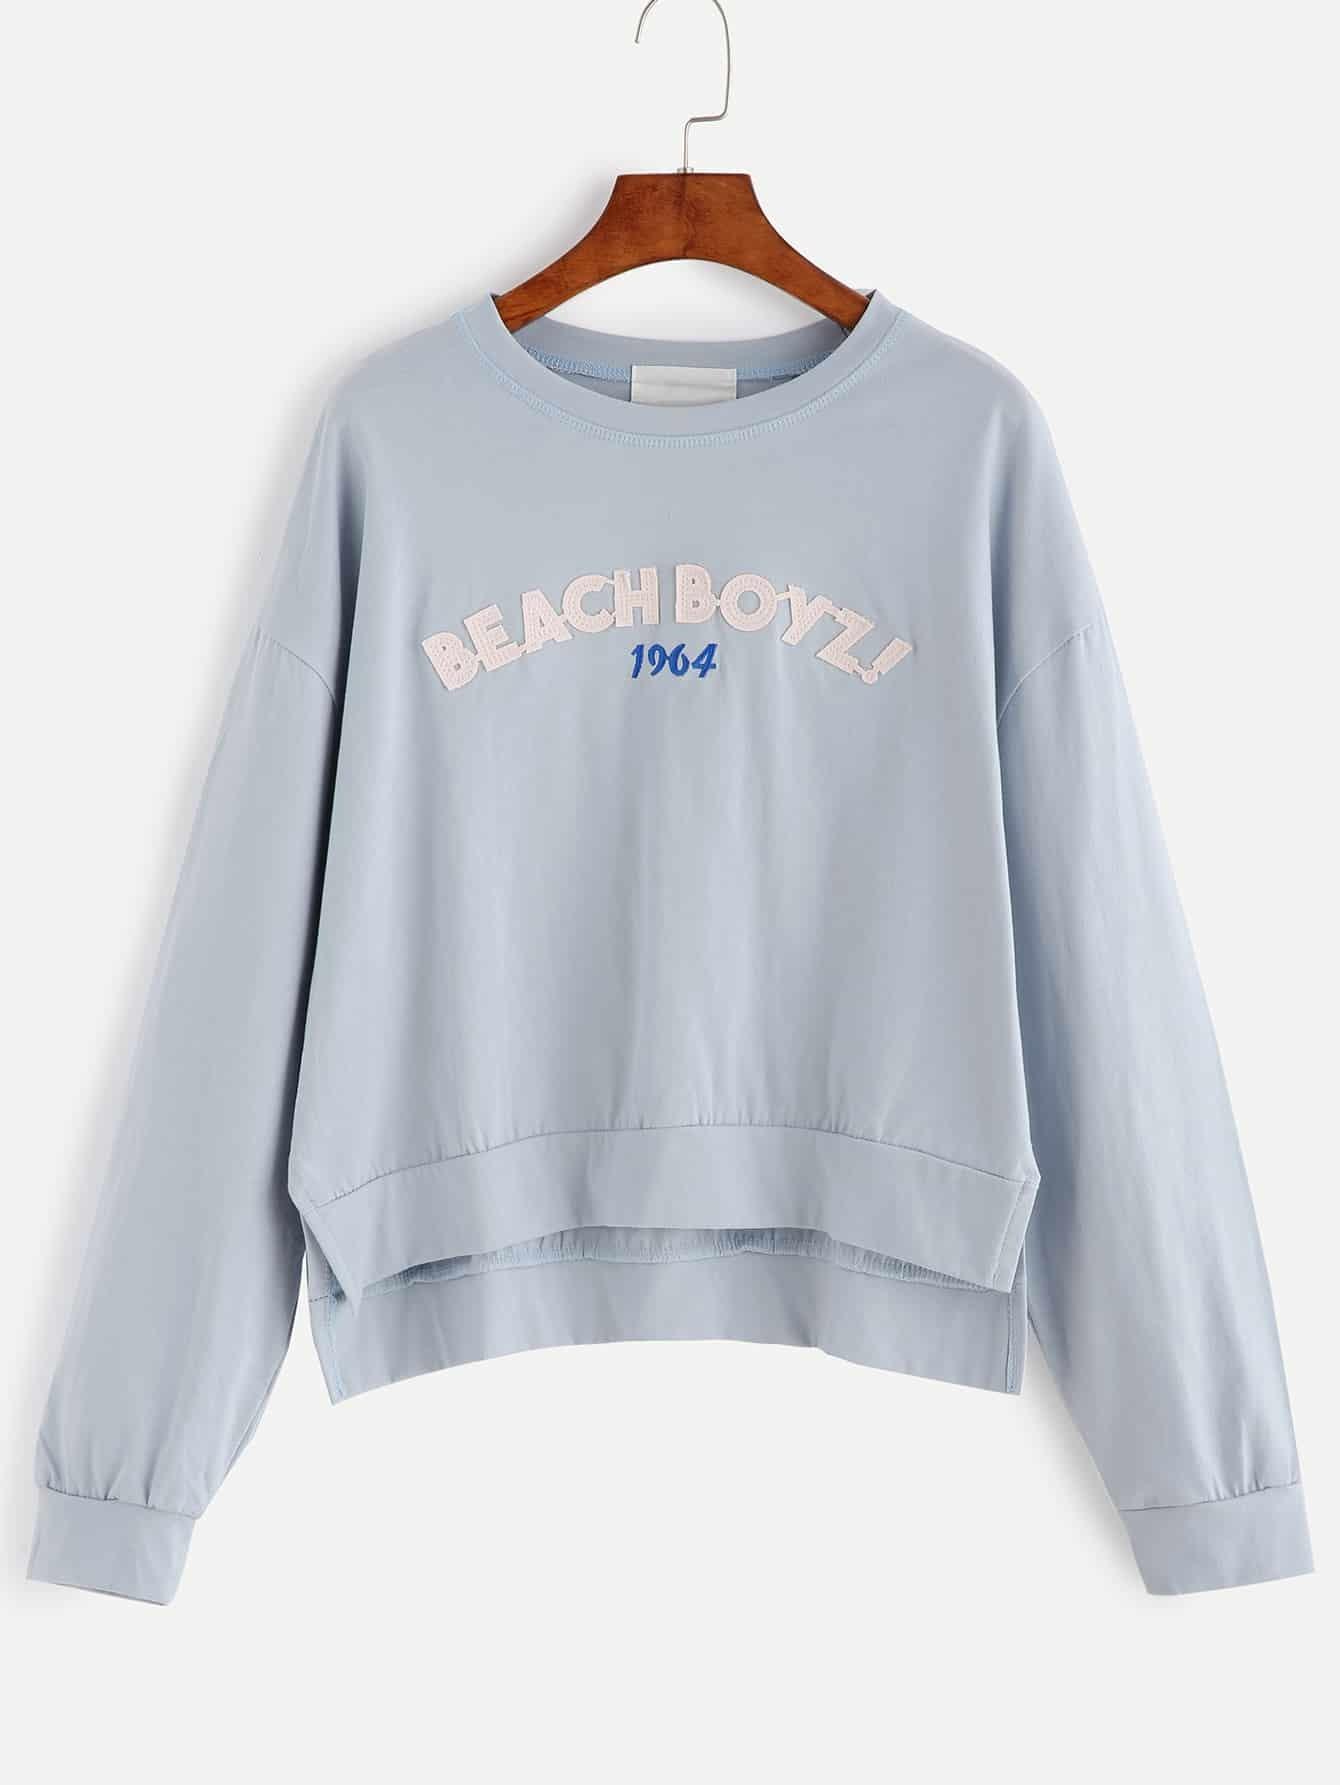 sweatshirt drop schulter vorne kurz hinen lang buchstaben blau german romwe. Black Bedroom Furniture Sets. Home Design Ideas